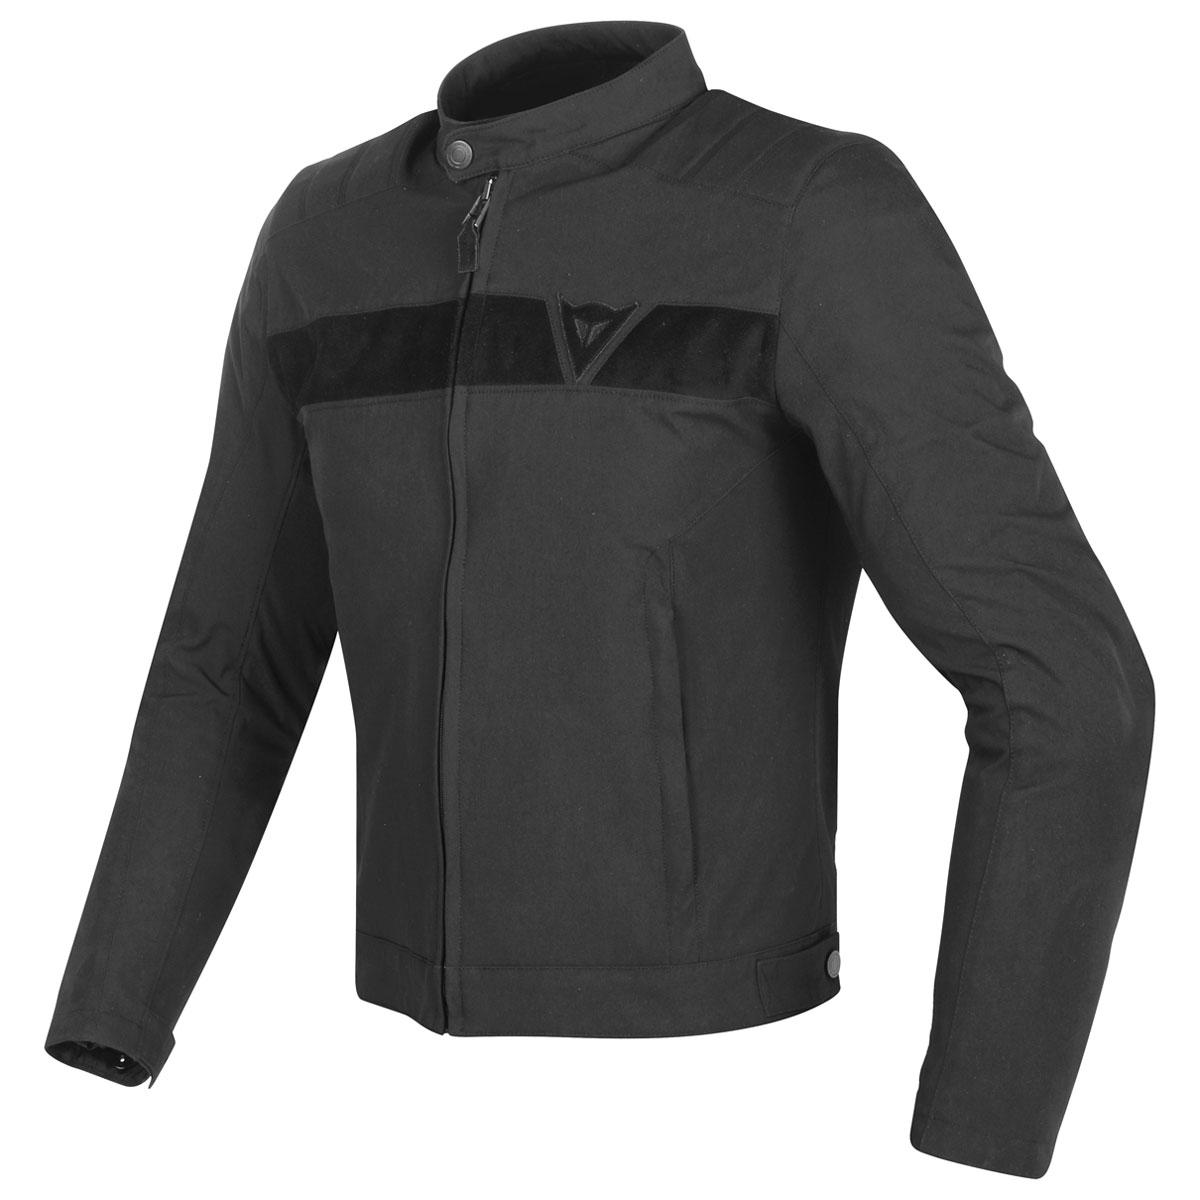 Dainese Men's Stripes Black Textile Jacket